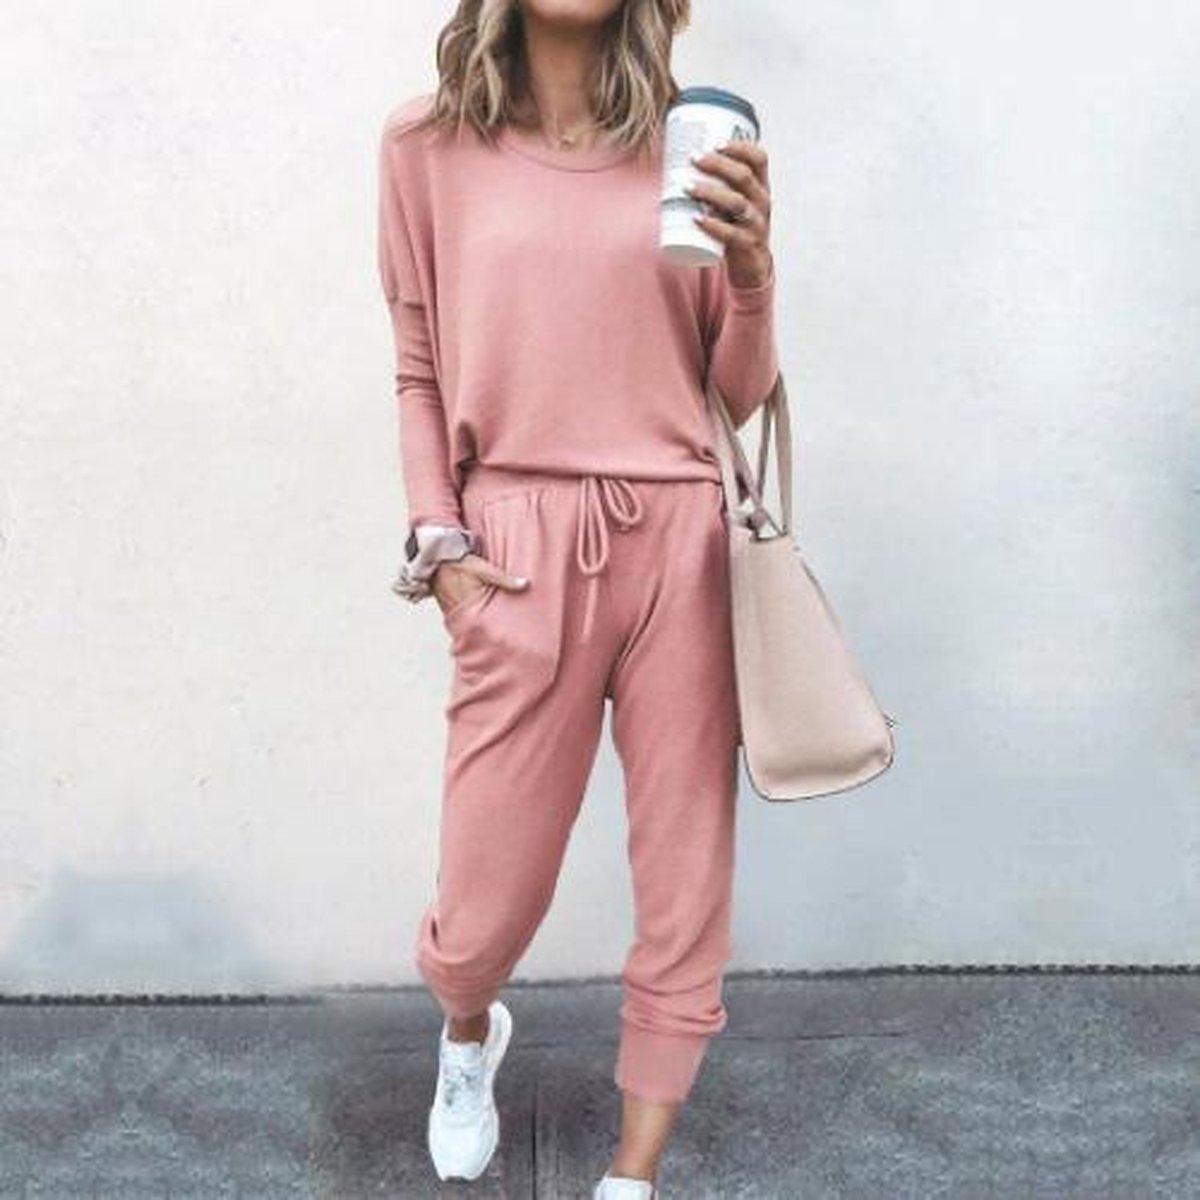 Joggingpak dames, huispak dames. Hamptons, kleur fuchsia/roze. Maat L